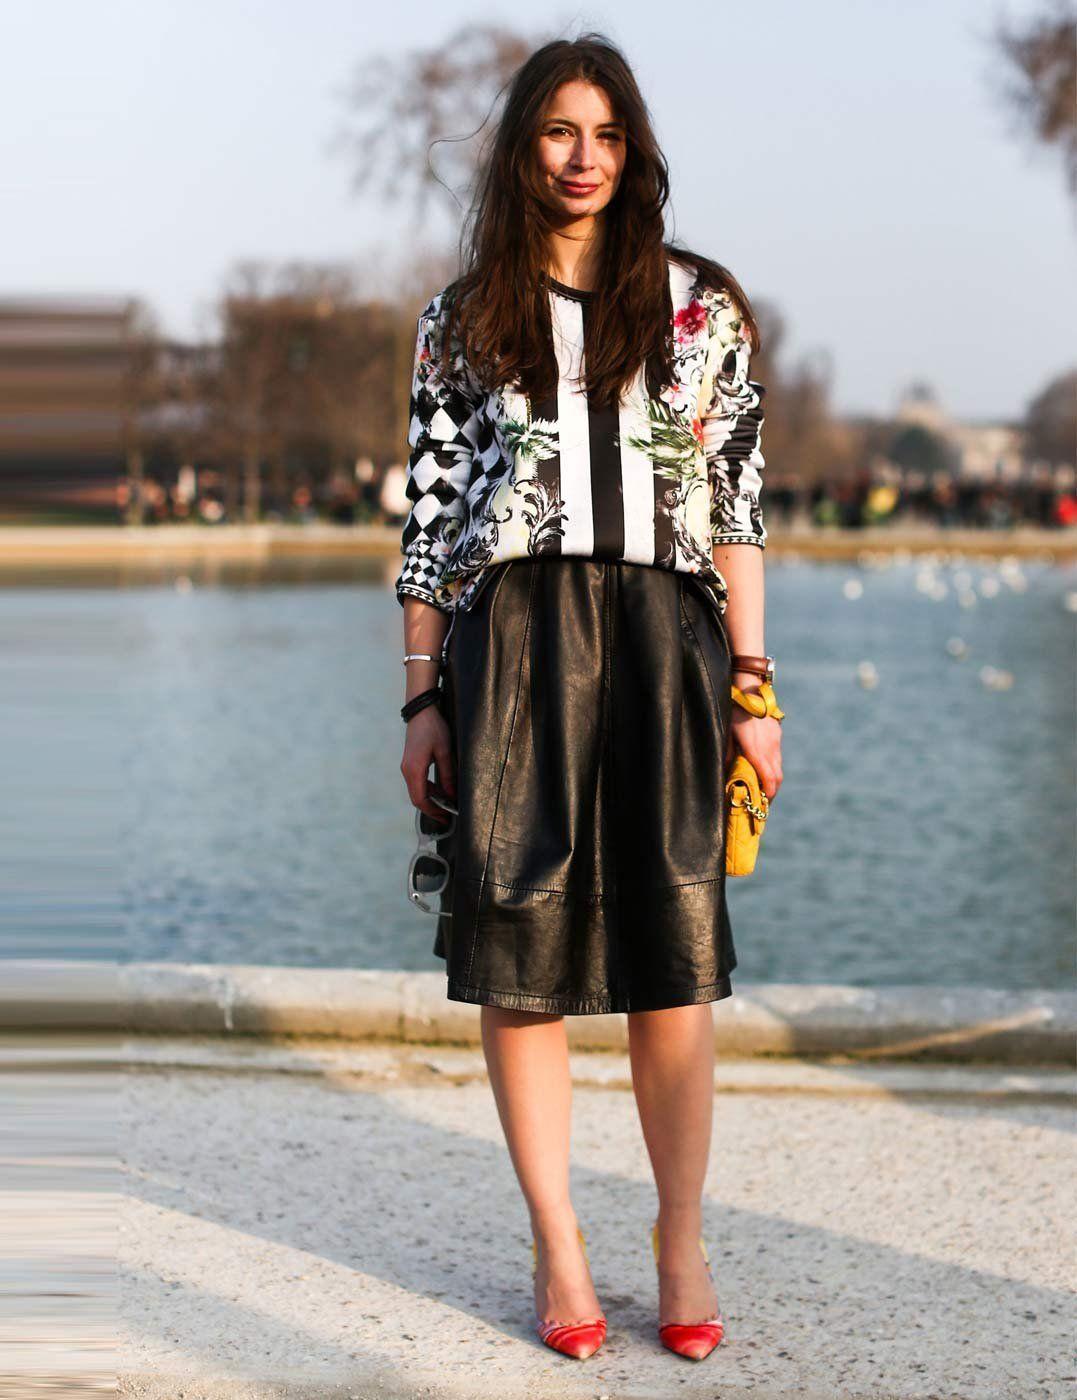 Best street style looks spotted at Paris Fashion Week Autumn / Winter 2013   ELLE UK